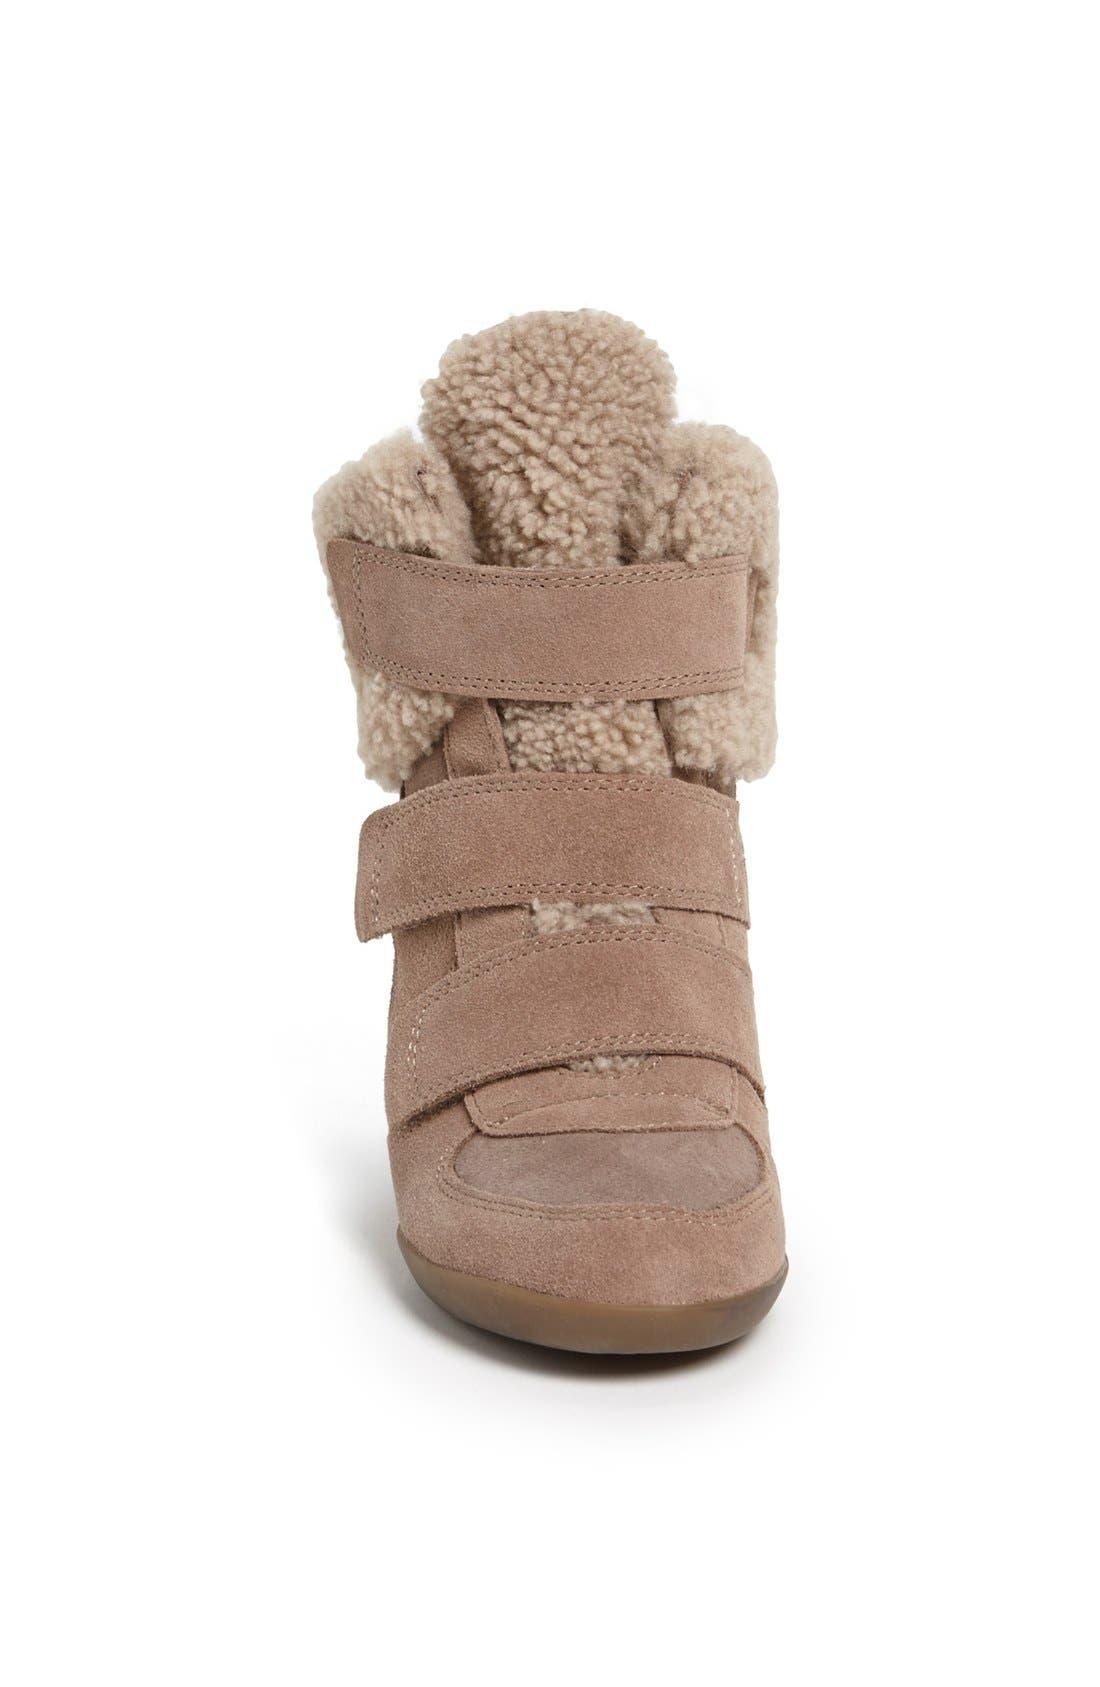 Alternate Image 3  - Ash 'Brizz' Shearling Cuff Hidden Wedge Sneaker